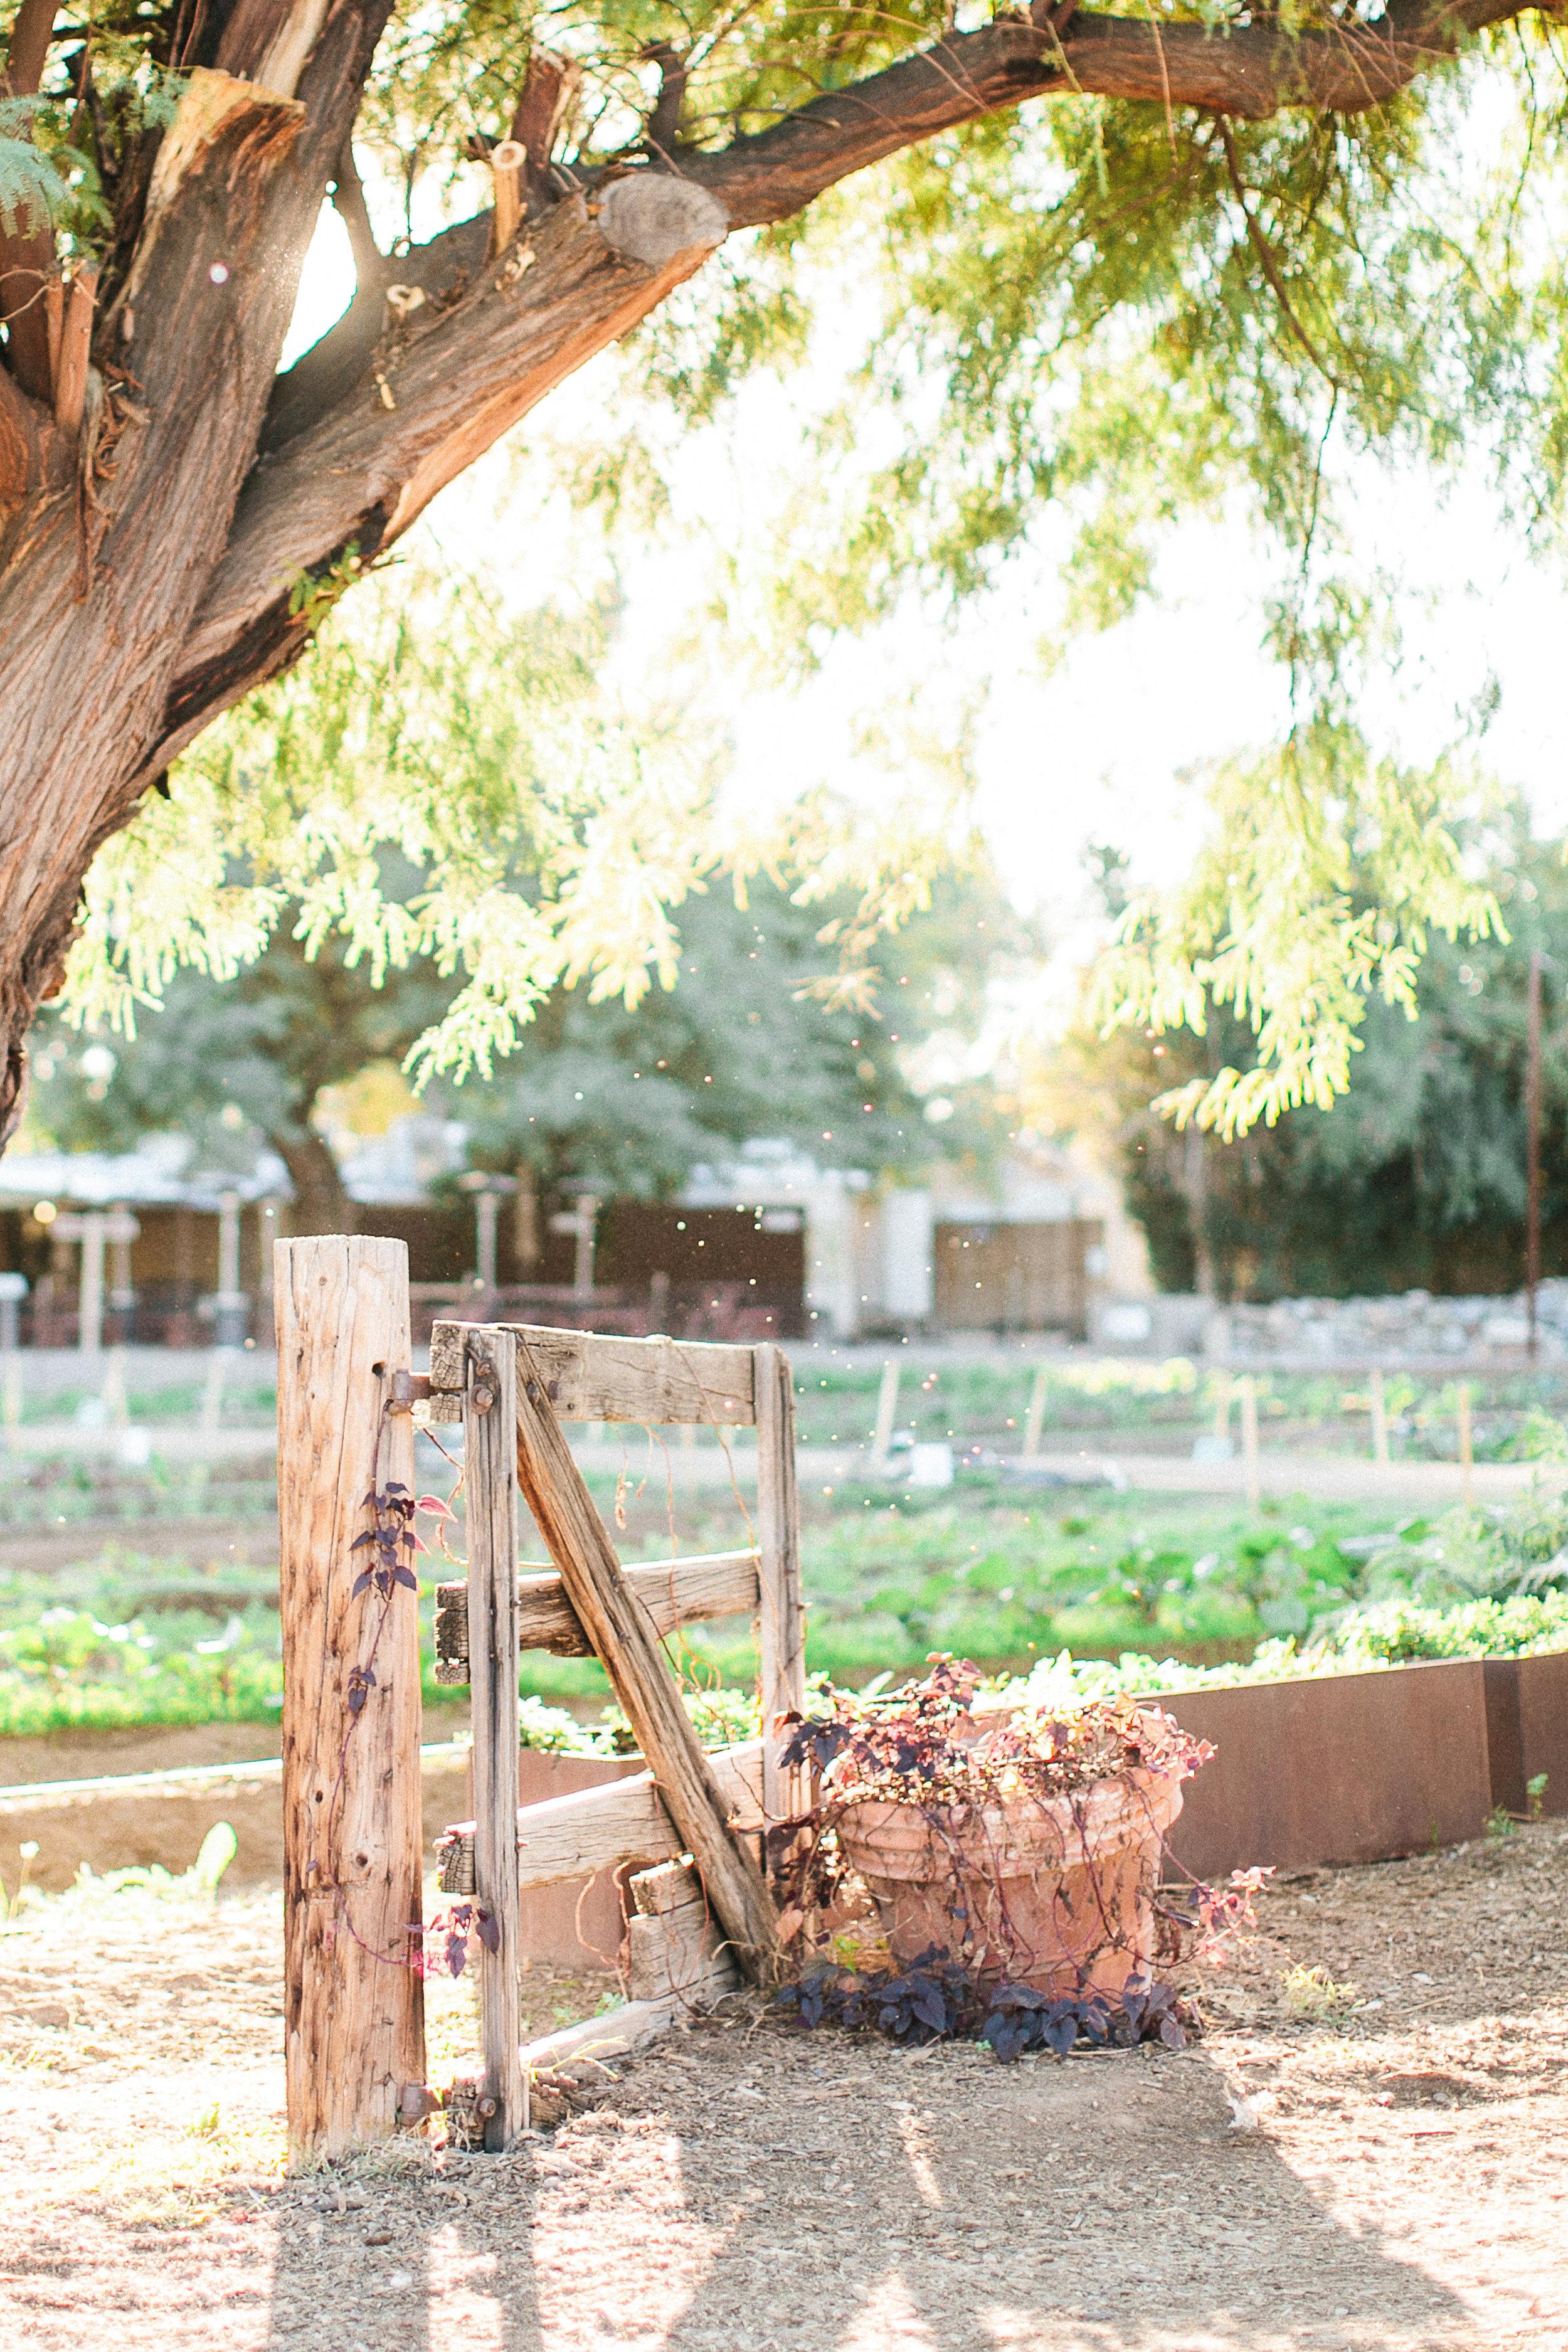 Arizona Engagement Shoot at The Farm: Alex & Charles- Konsider It Done- AZ Arizona Wedding & Event Planner, Designer, Coordinator Planning in Scottsdale, Phoenix, Paradise Valley, Tempe, Gilbert, Mesa, Chandler, Tucson, Sedona